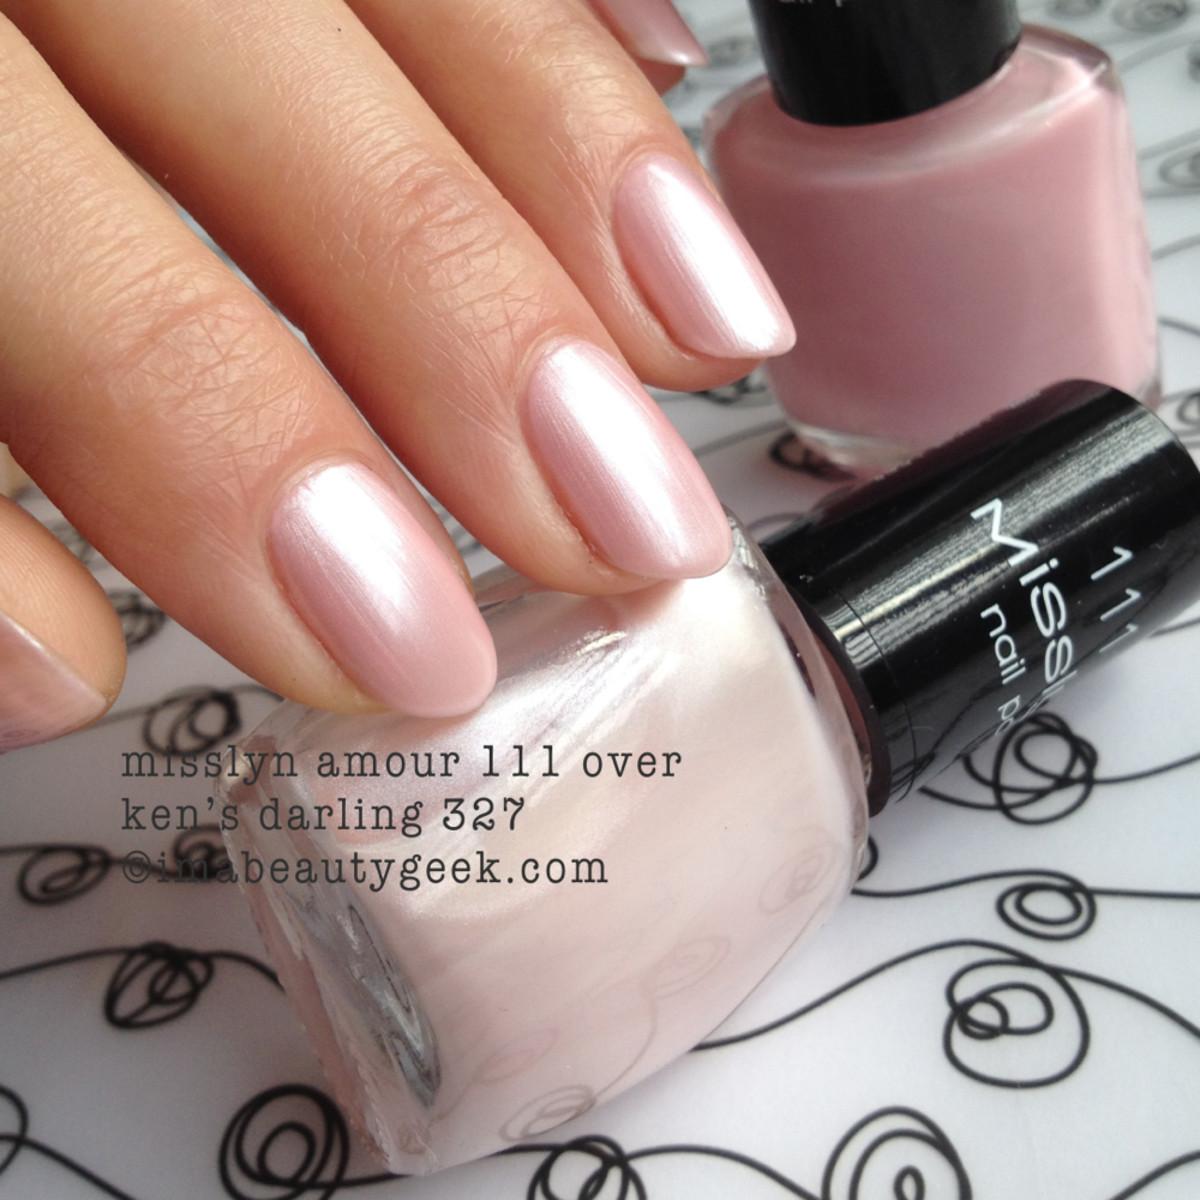 misslyn amour 111 nail polish